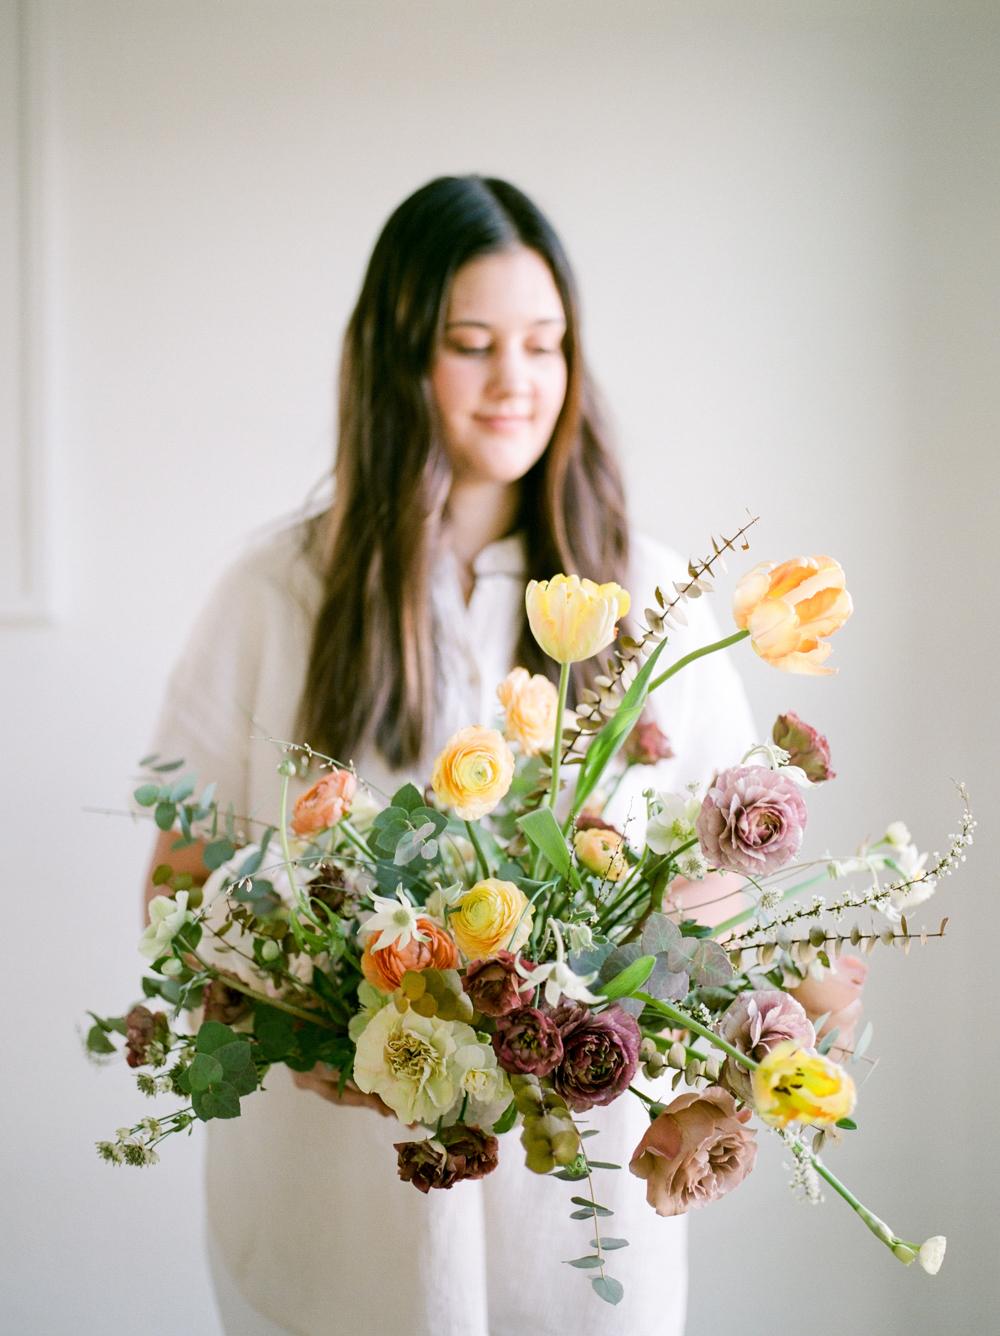 Christine-Gosch-Lexie-Sandberg-Carpe-diem-flowers-florals-design-wedding-flowers-salt-lake-city-branding-photos-styling-bridal-bouquet-centerpieces-film-photographer-11.jpg